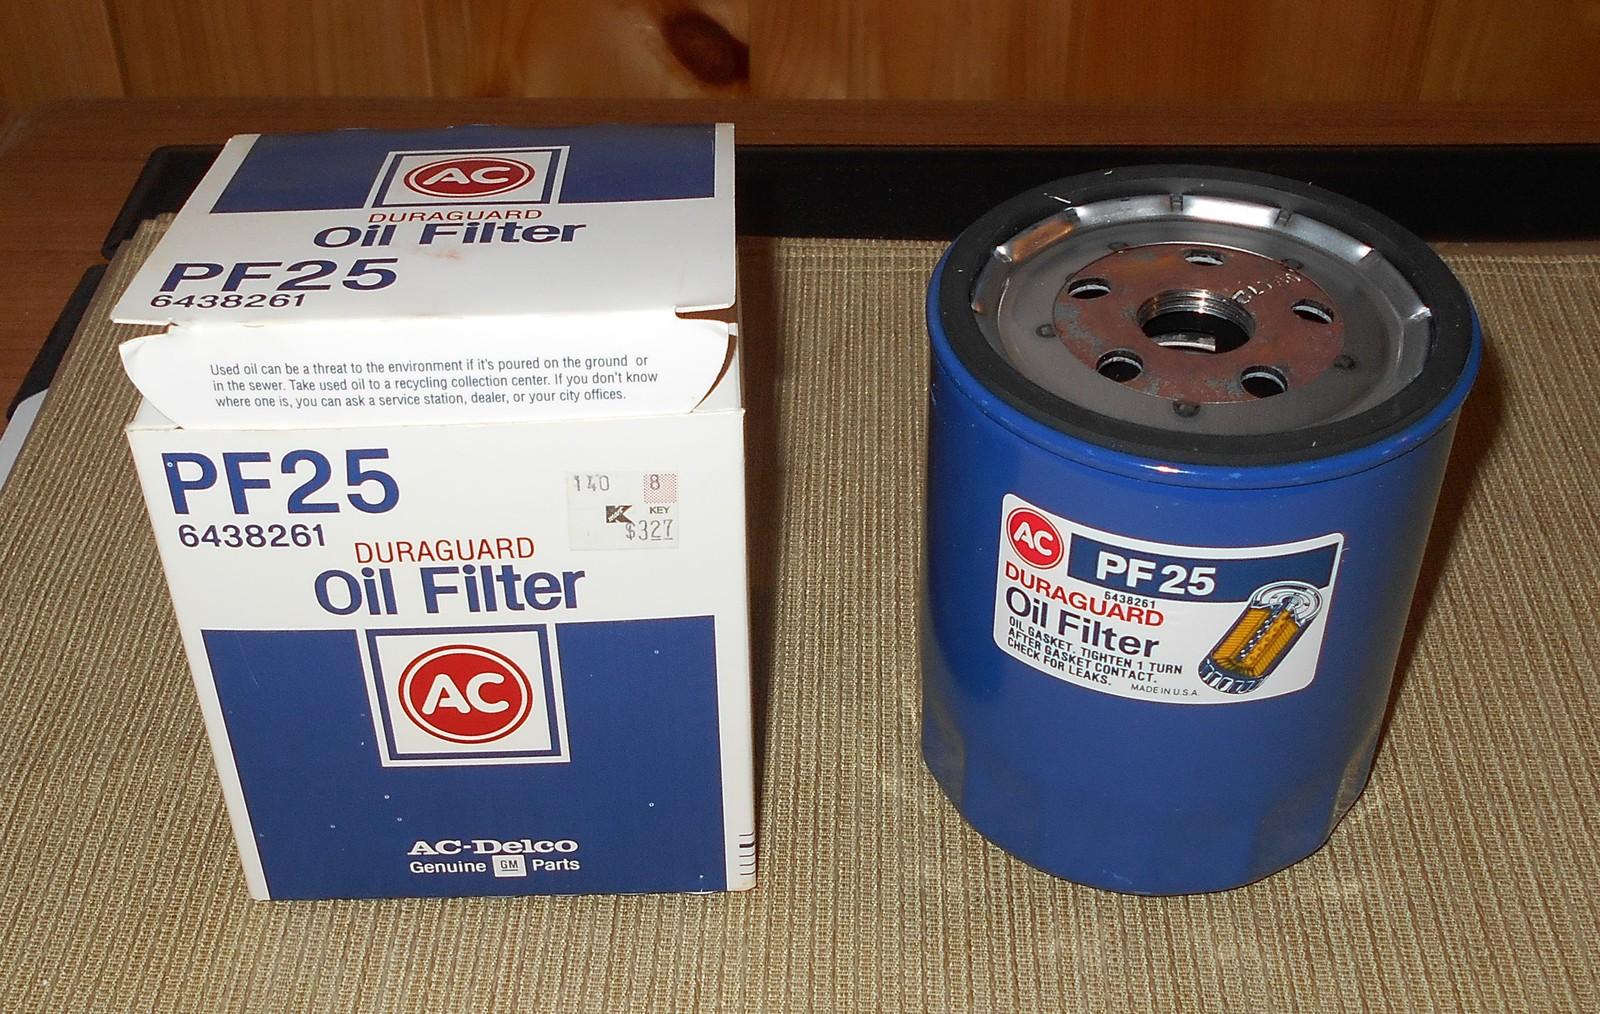 ac duraguard oil filter pf25 6438261 oil filters. Black Bedroom Furniture Sets. Home Design Ideas